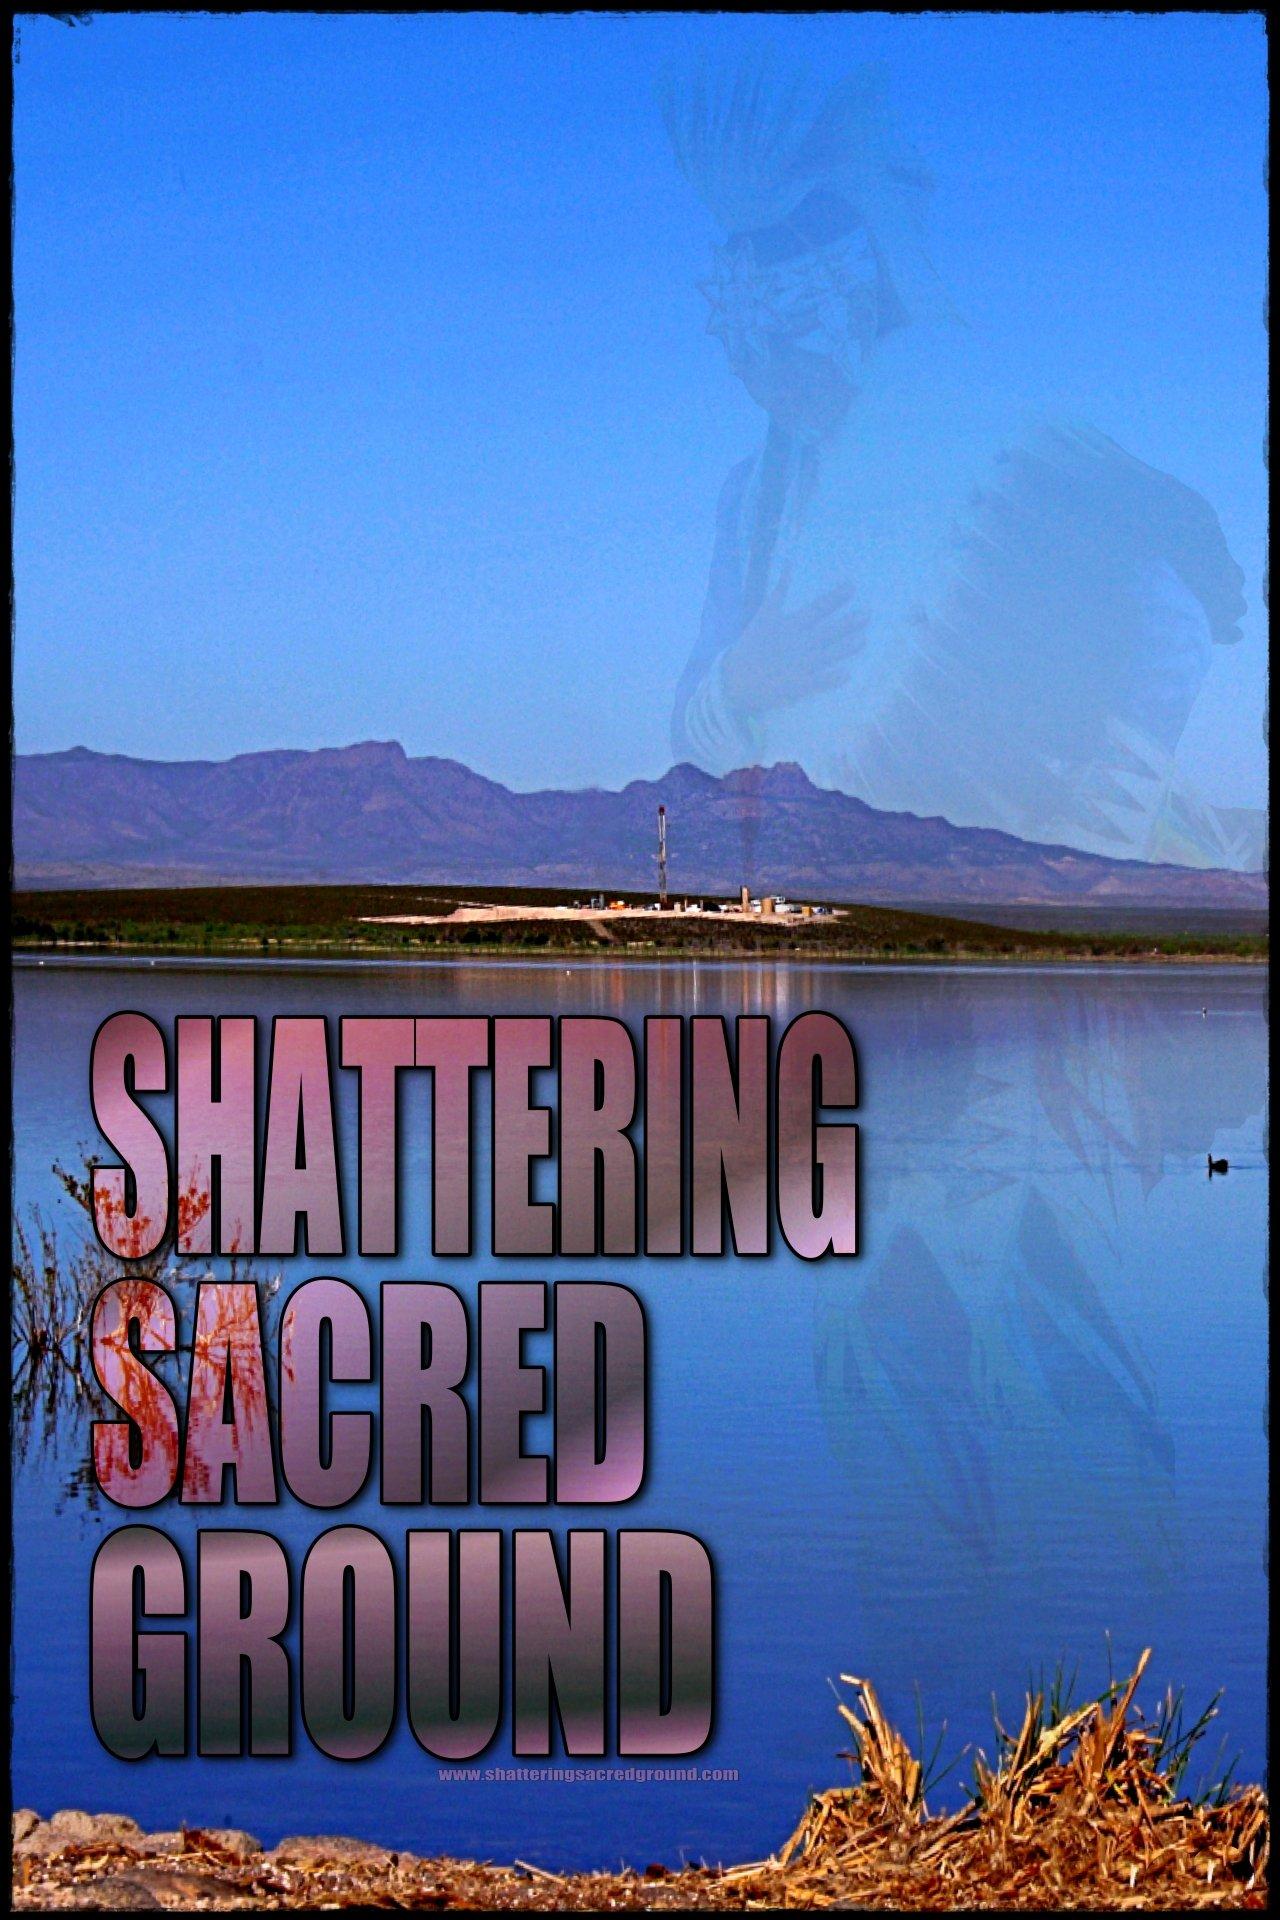 Shattering Sacred Ground